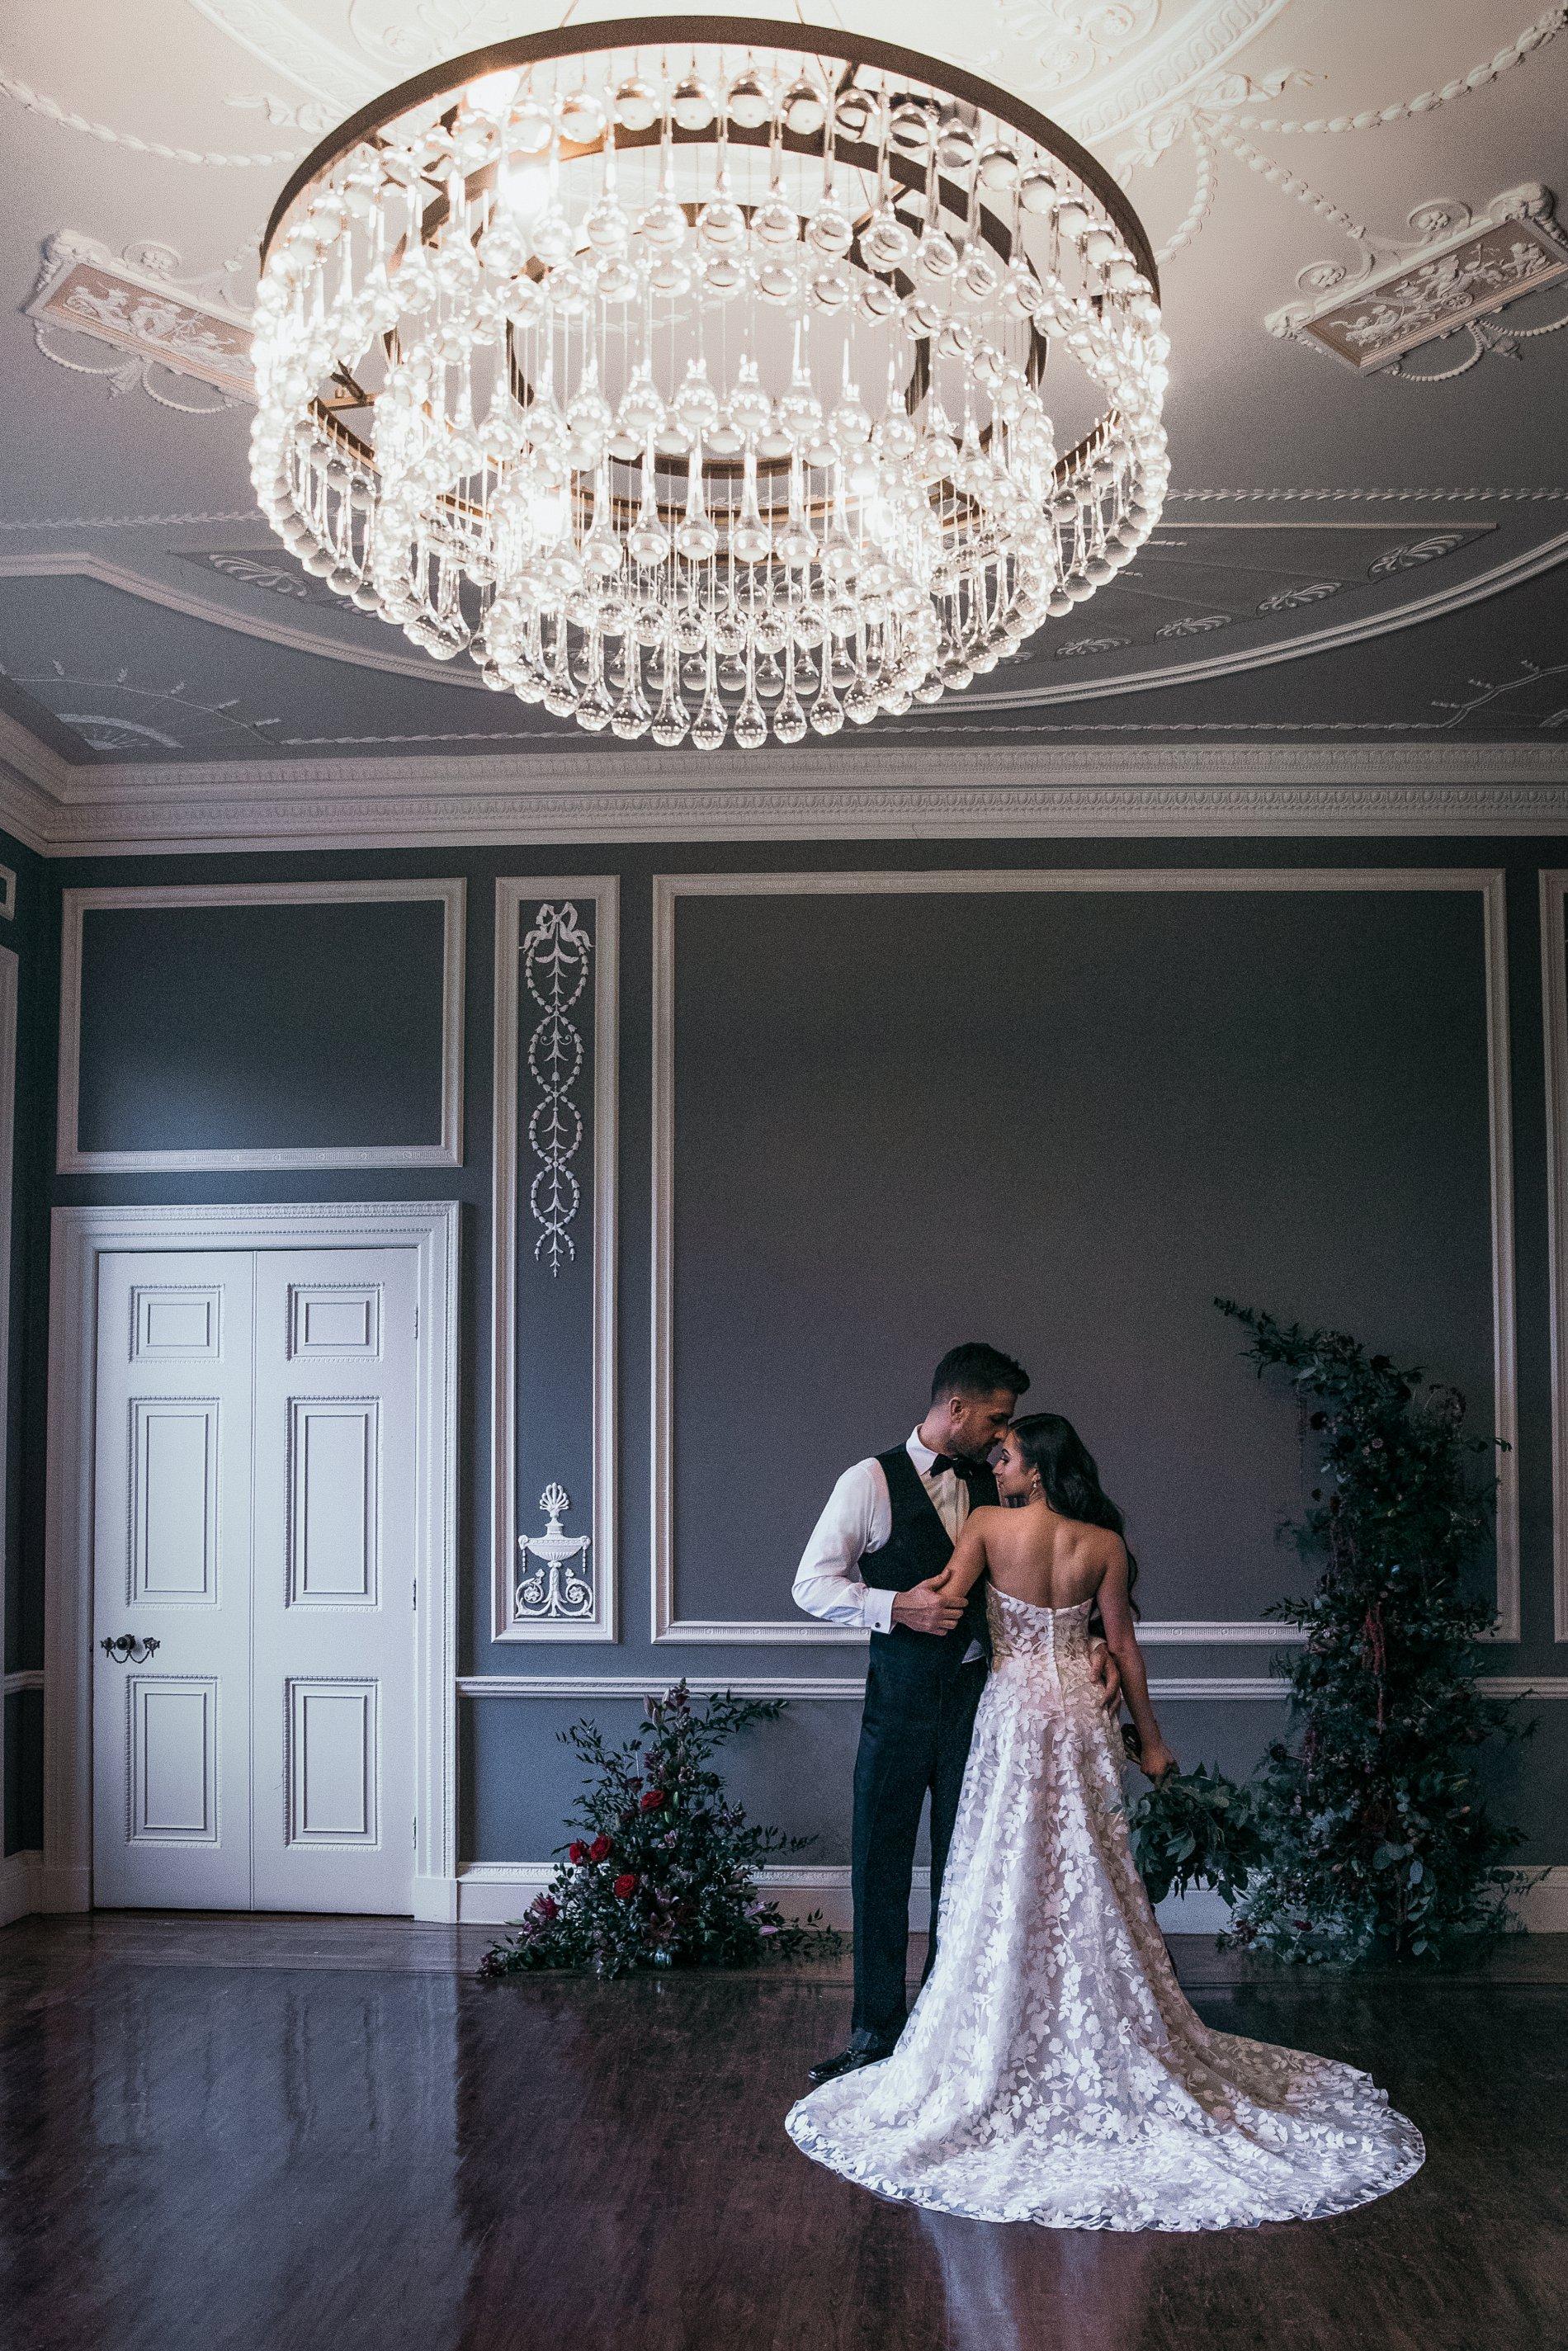 A Black Tie Wedding Creative Shoot at Saltmarshe Hall (c) Natalie Hamilton Photography (18)